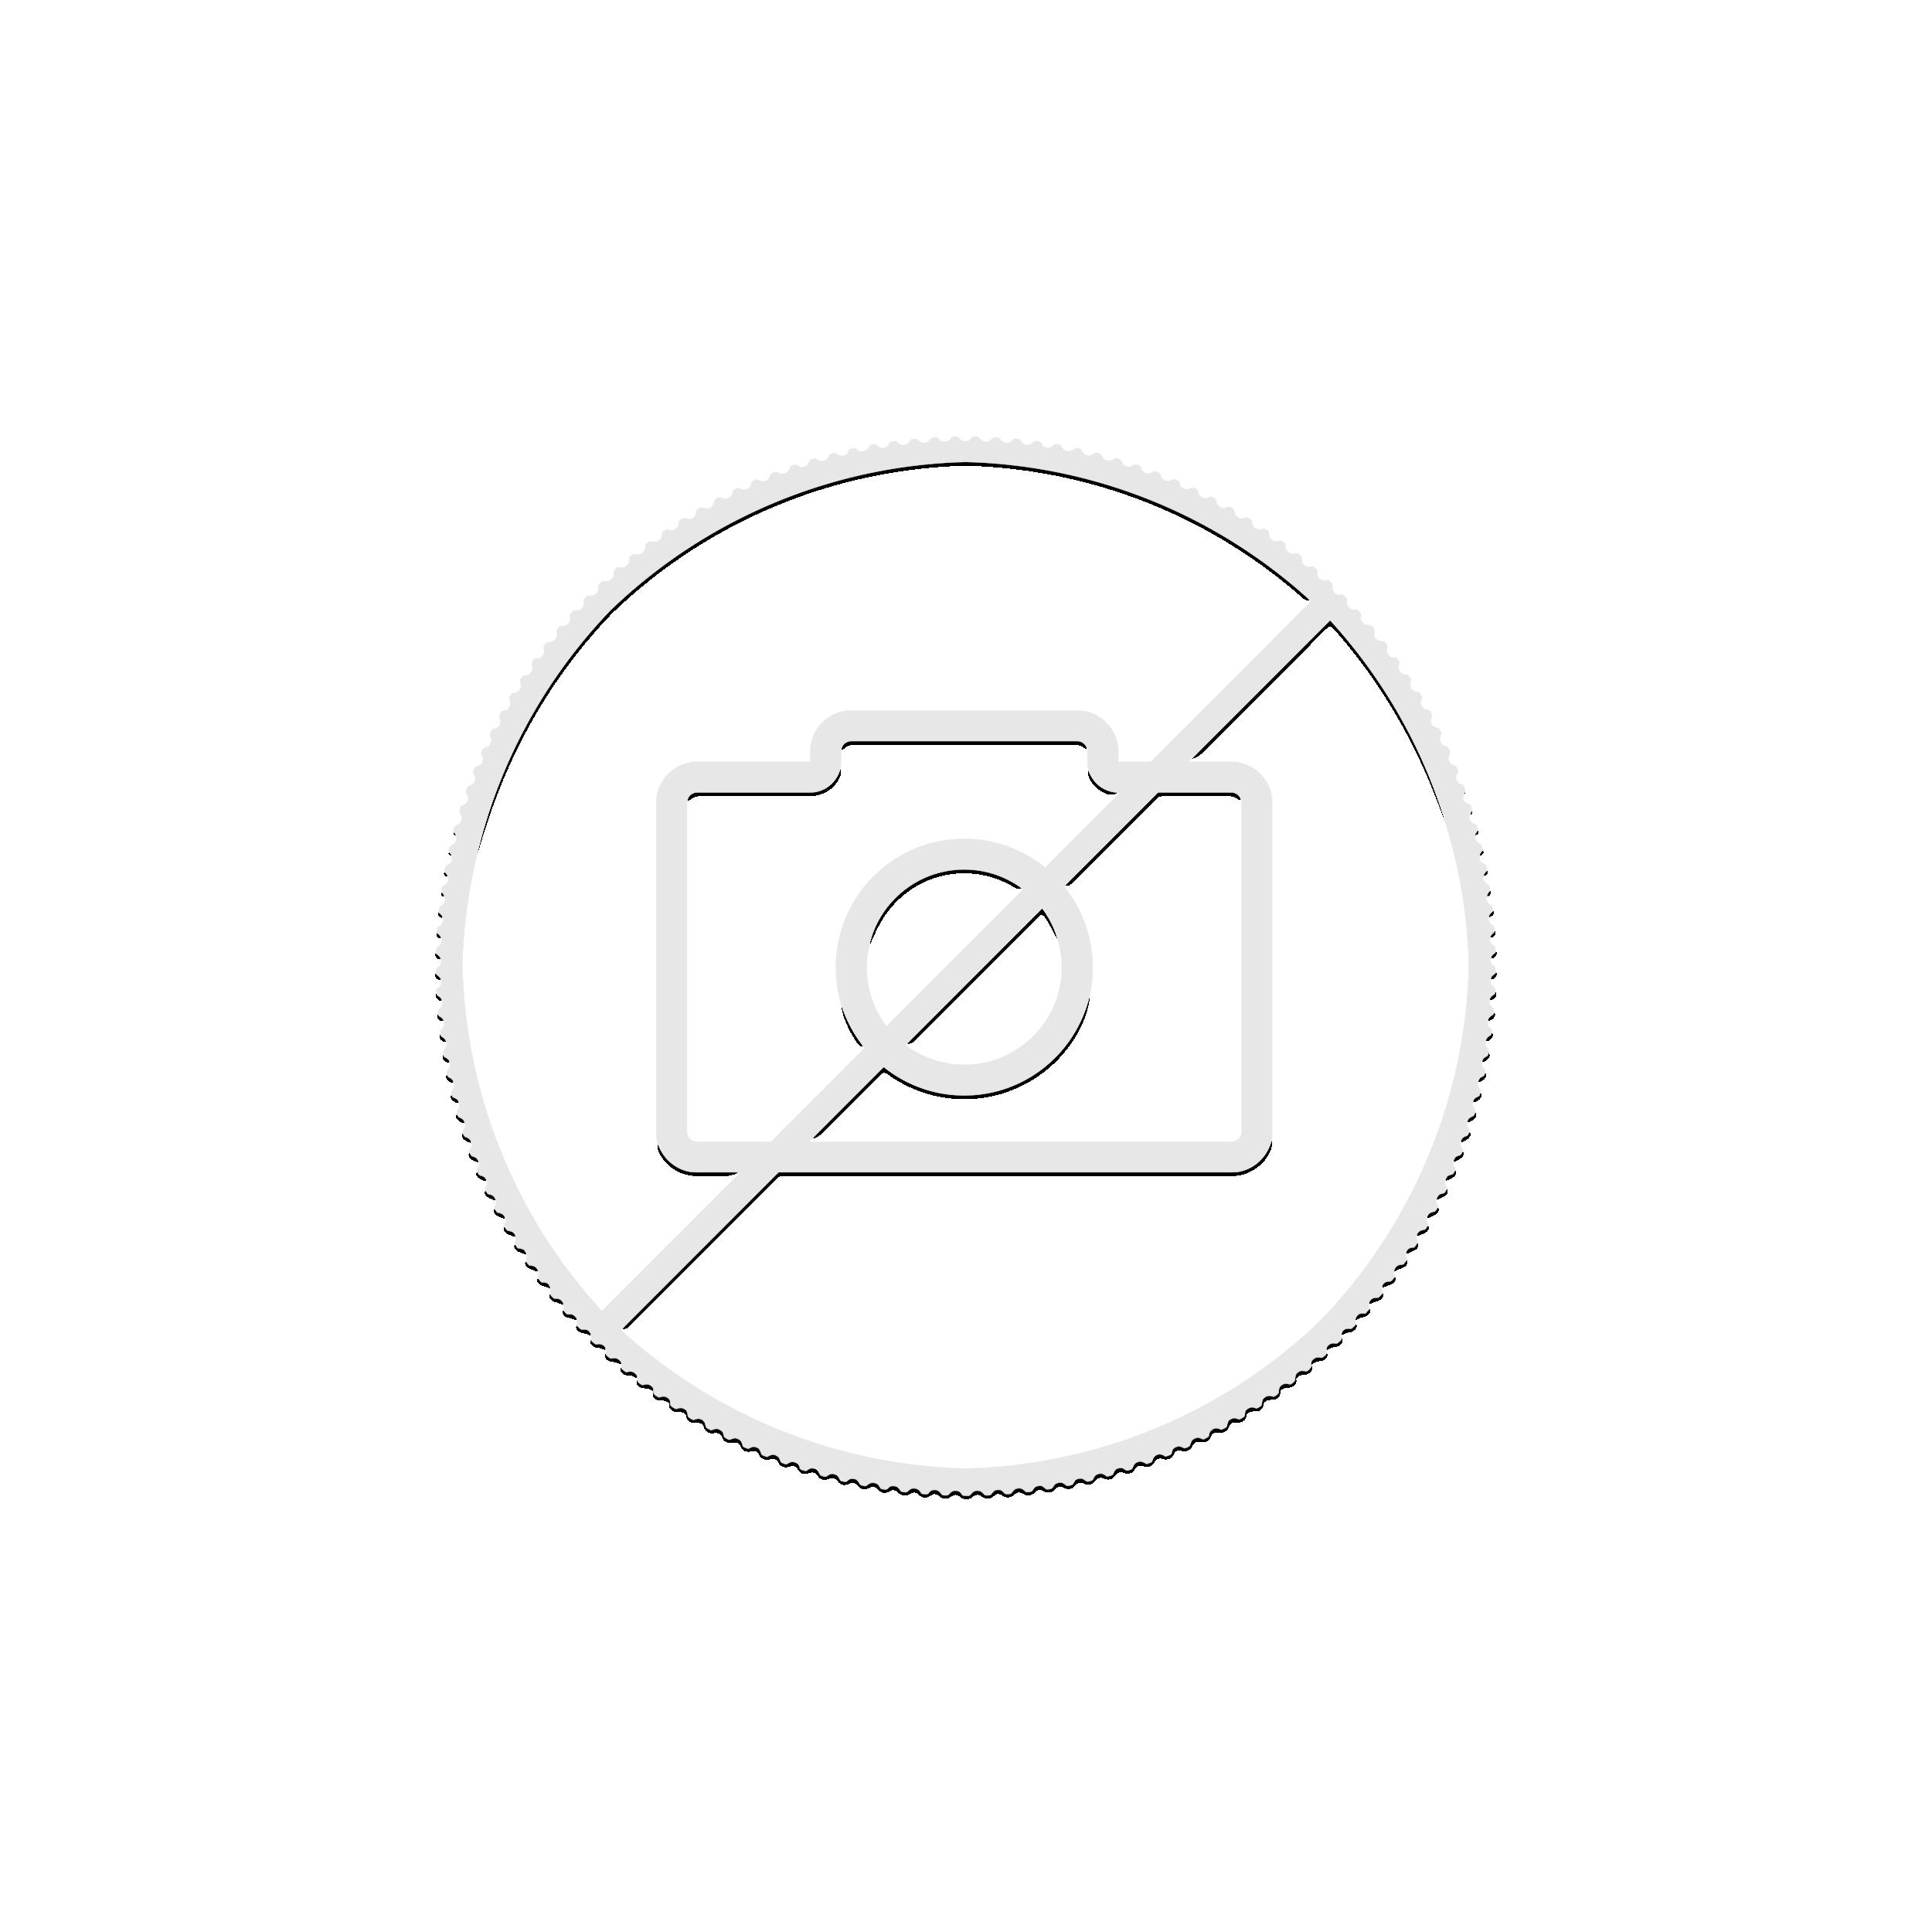 1 Kilo silver coin Kookaburra 2021